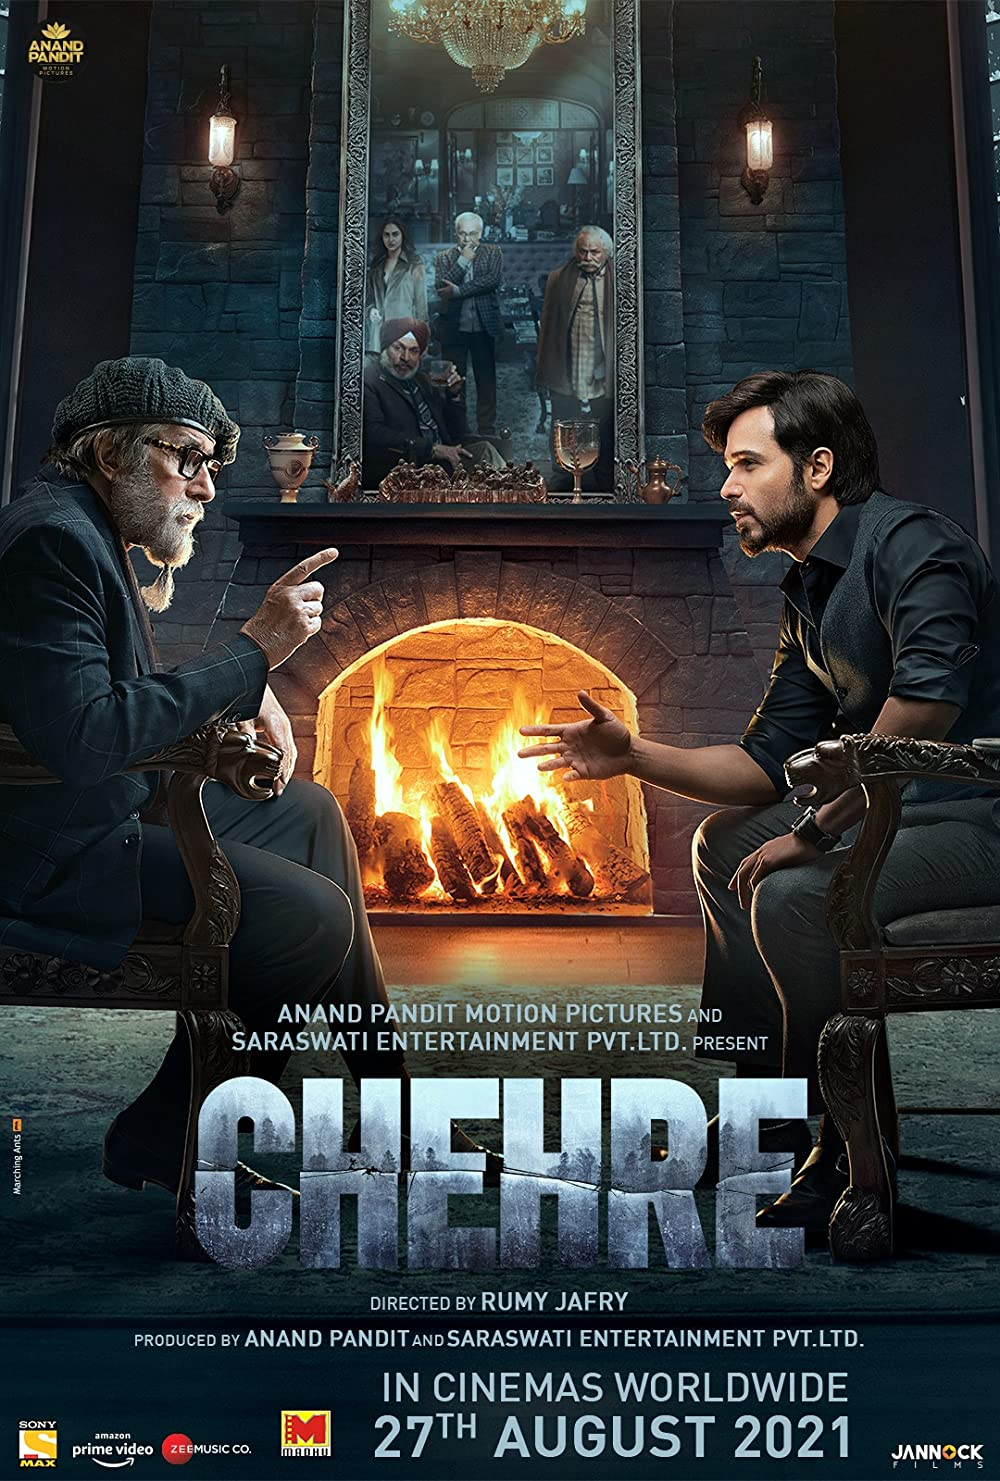 Chehre 2021 Hindi Movie 720p AMZN HDRip ESub 950MB x264 AAC